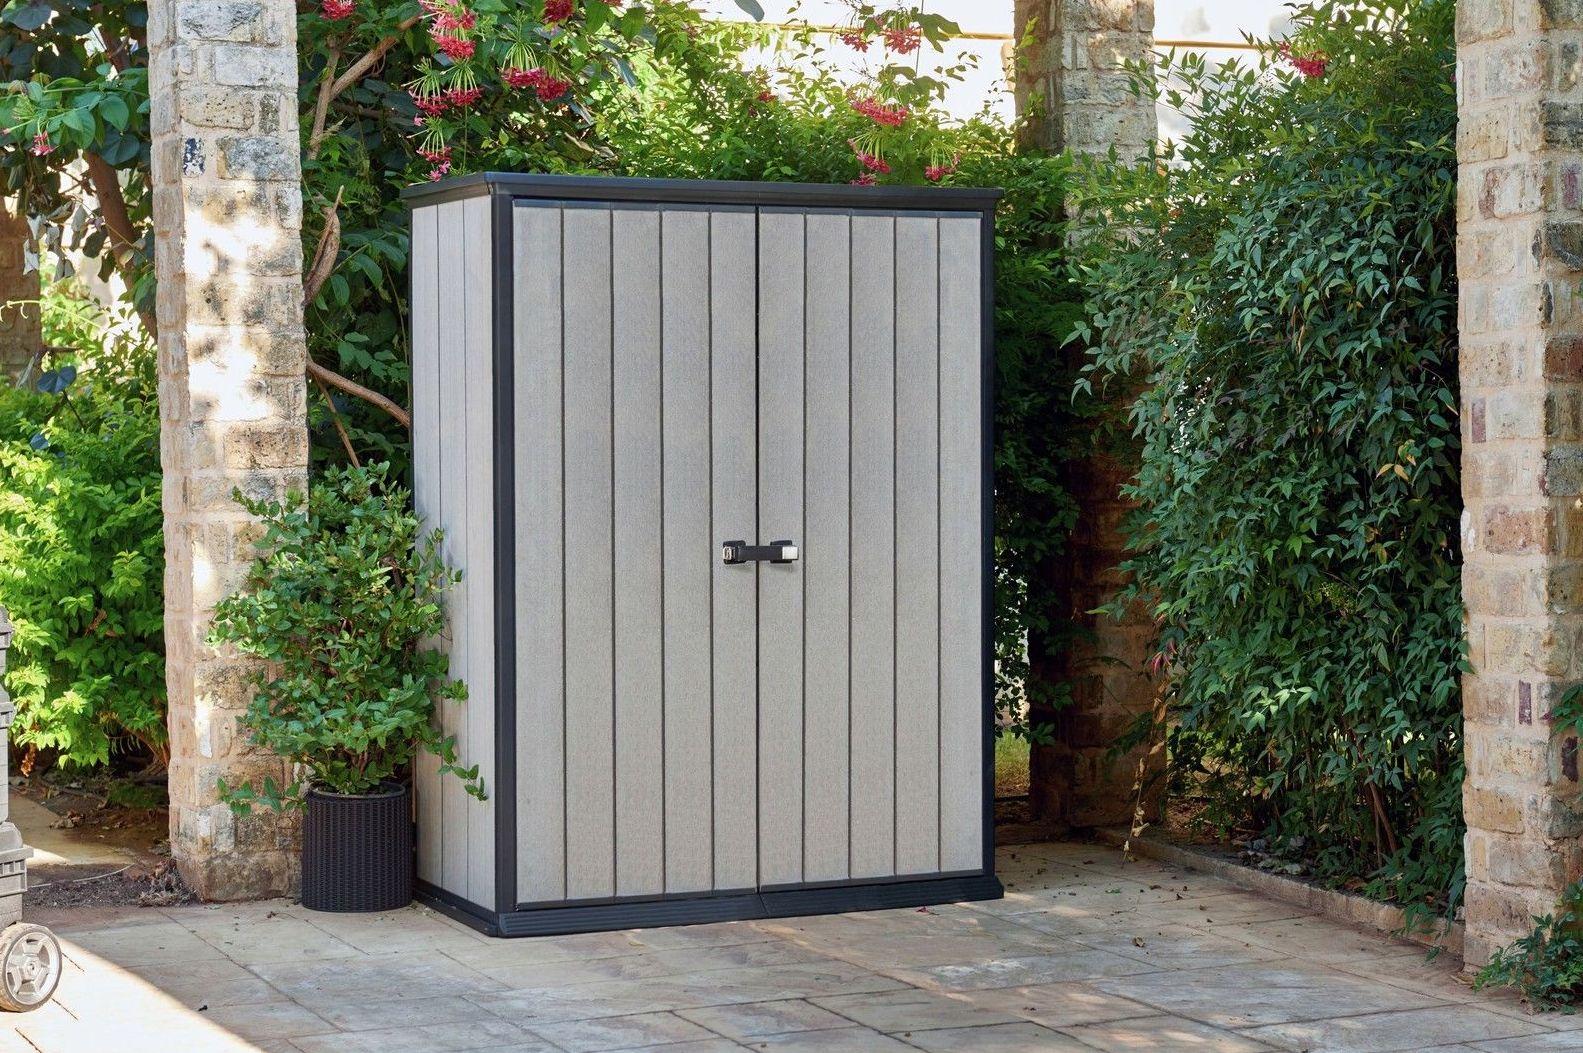 Small Outdoor Storage Units - Keter Garden Store